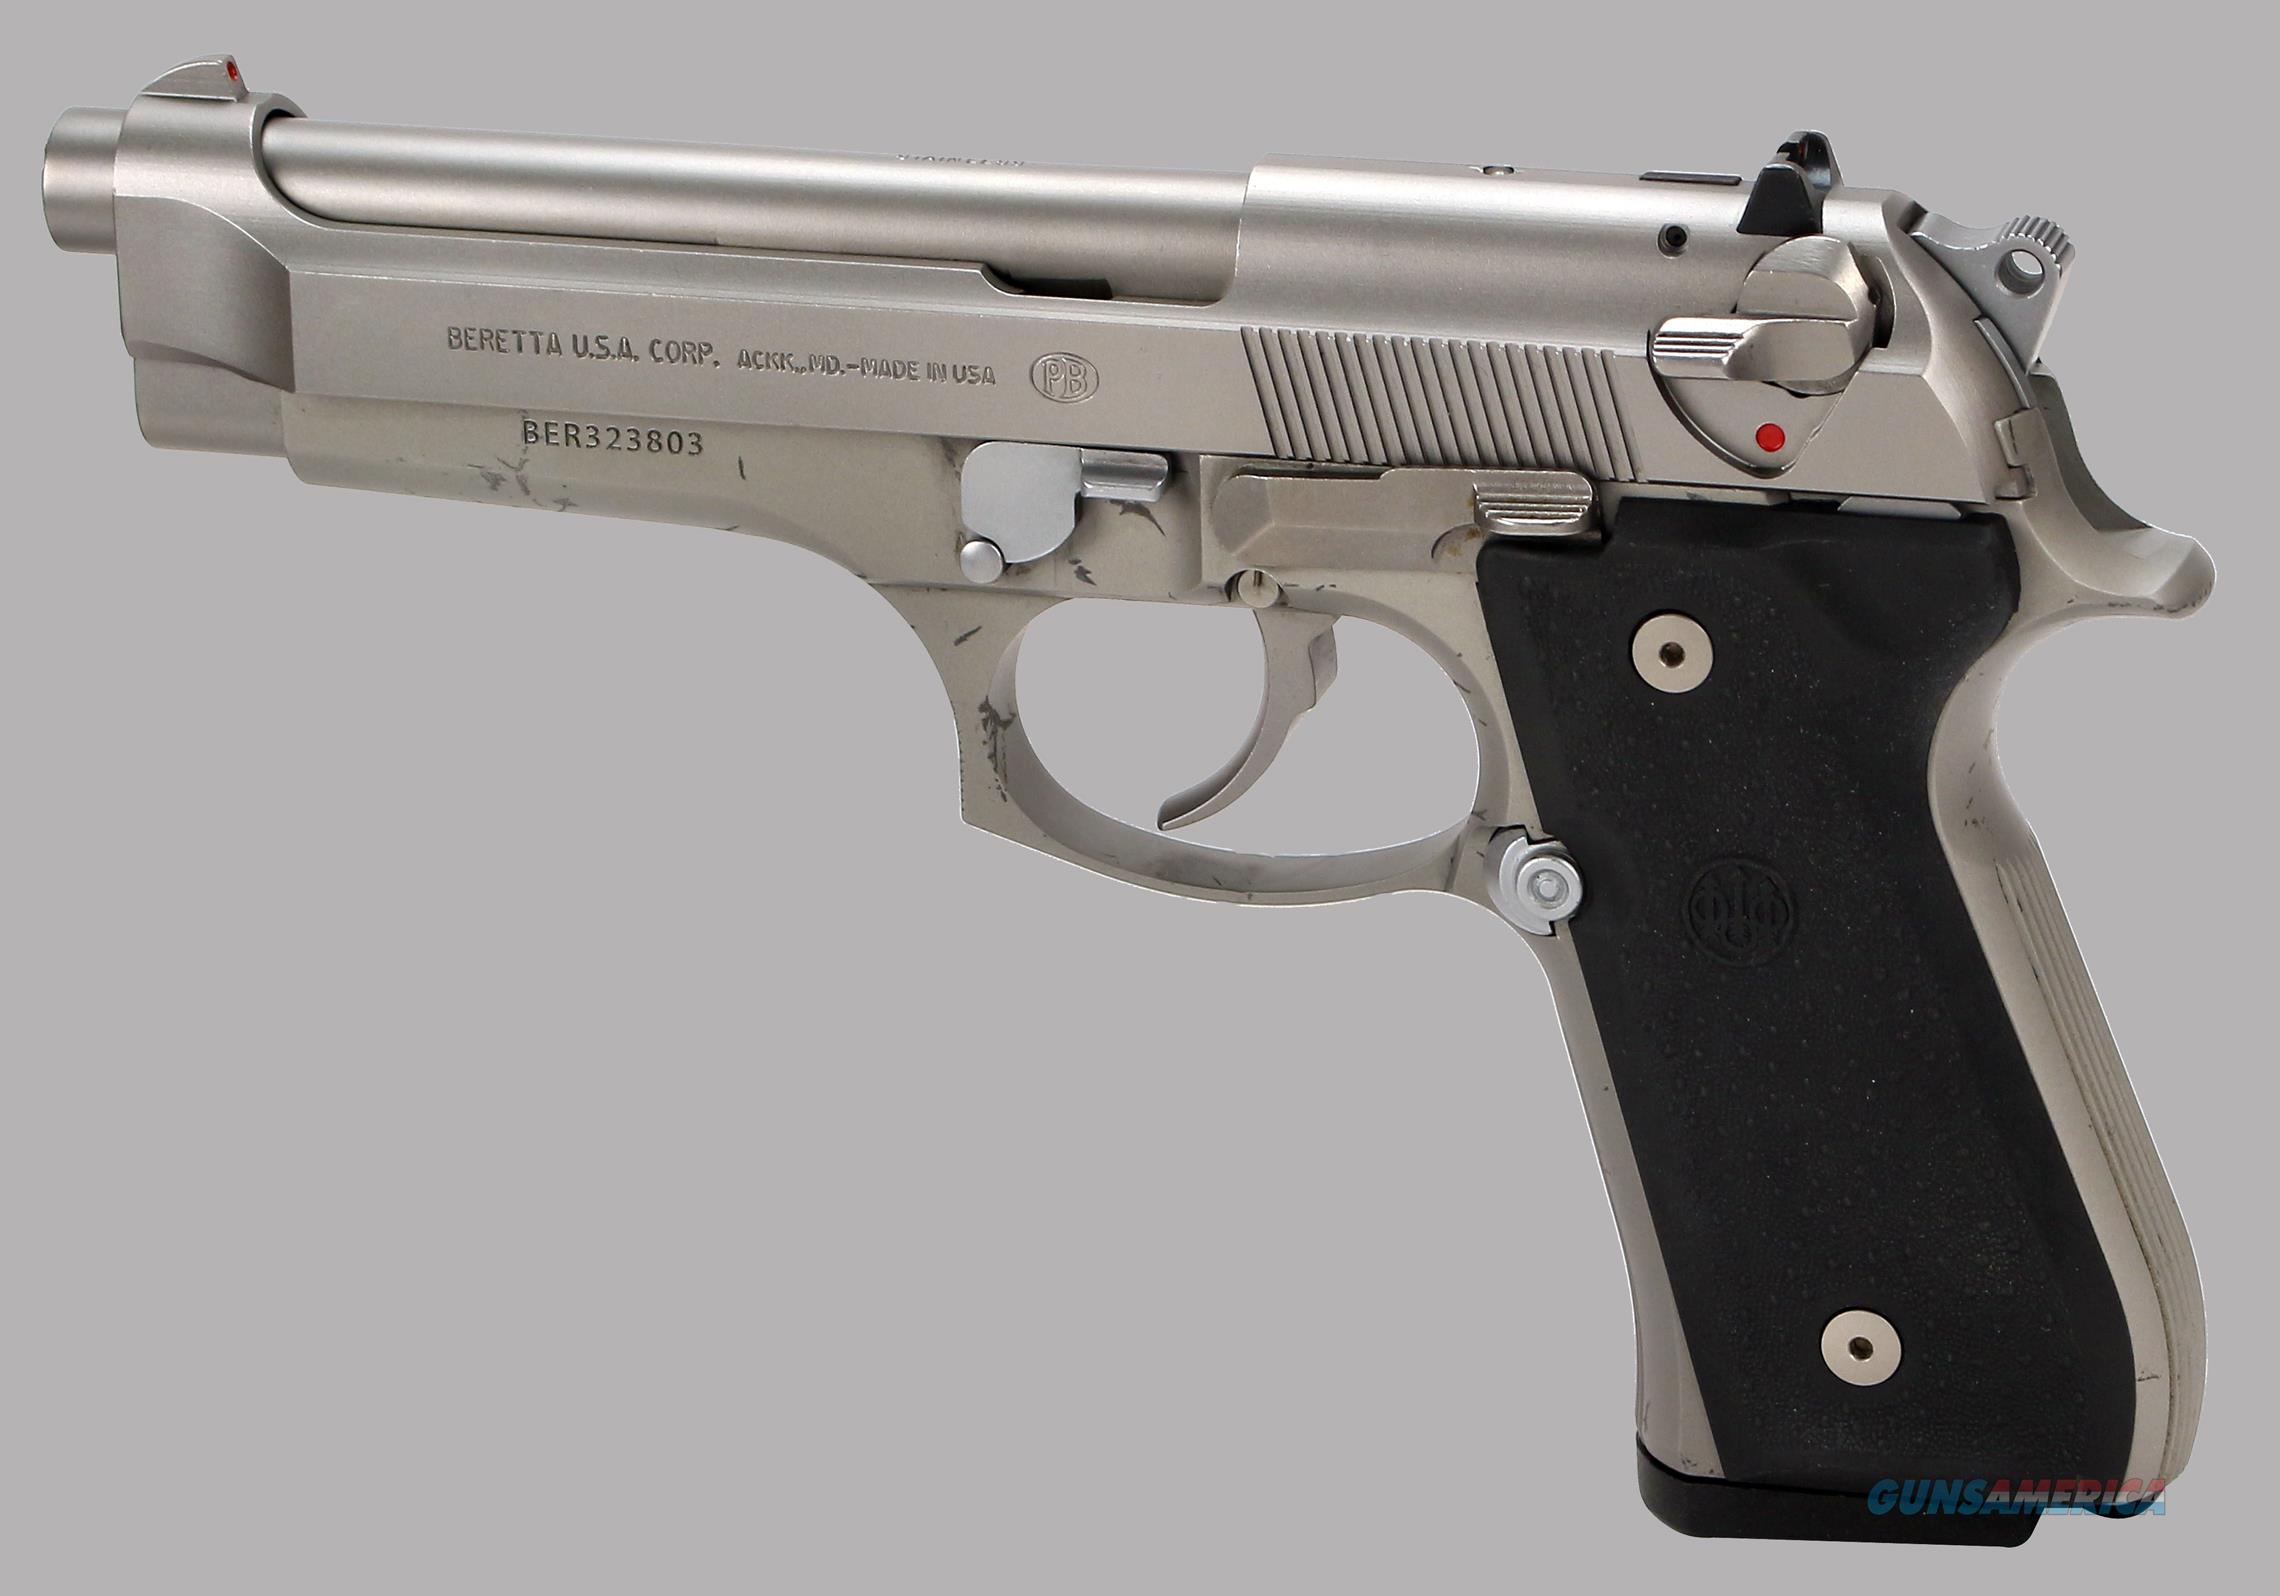 Beretta 92FS 9mm Pistol for sale